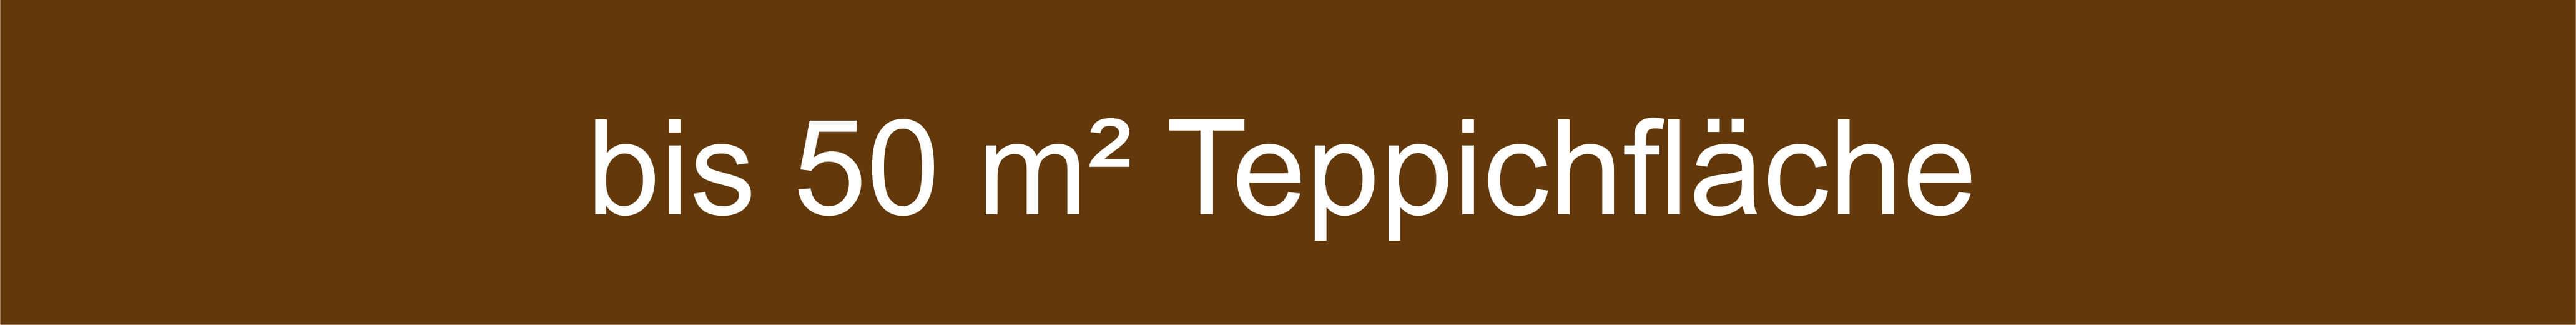 Mengenempfehlung Teppiche bis 50 Quadratmeter